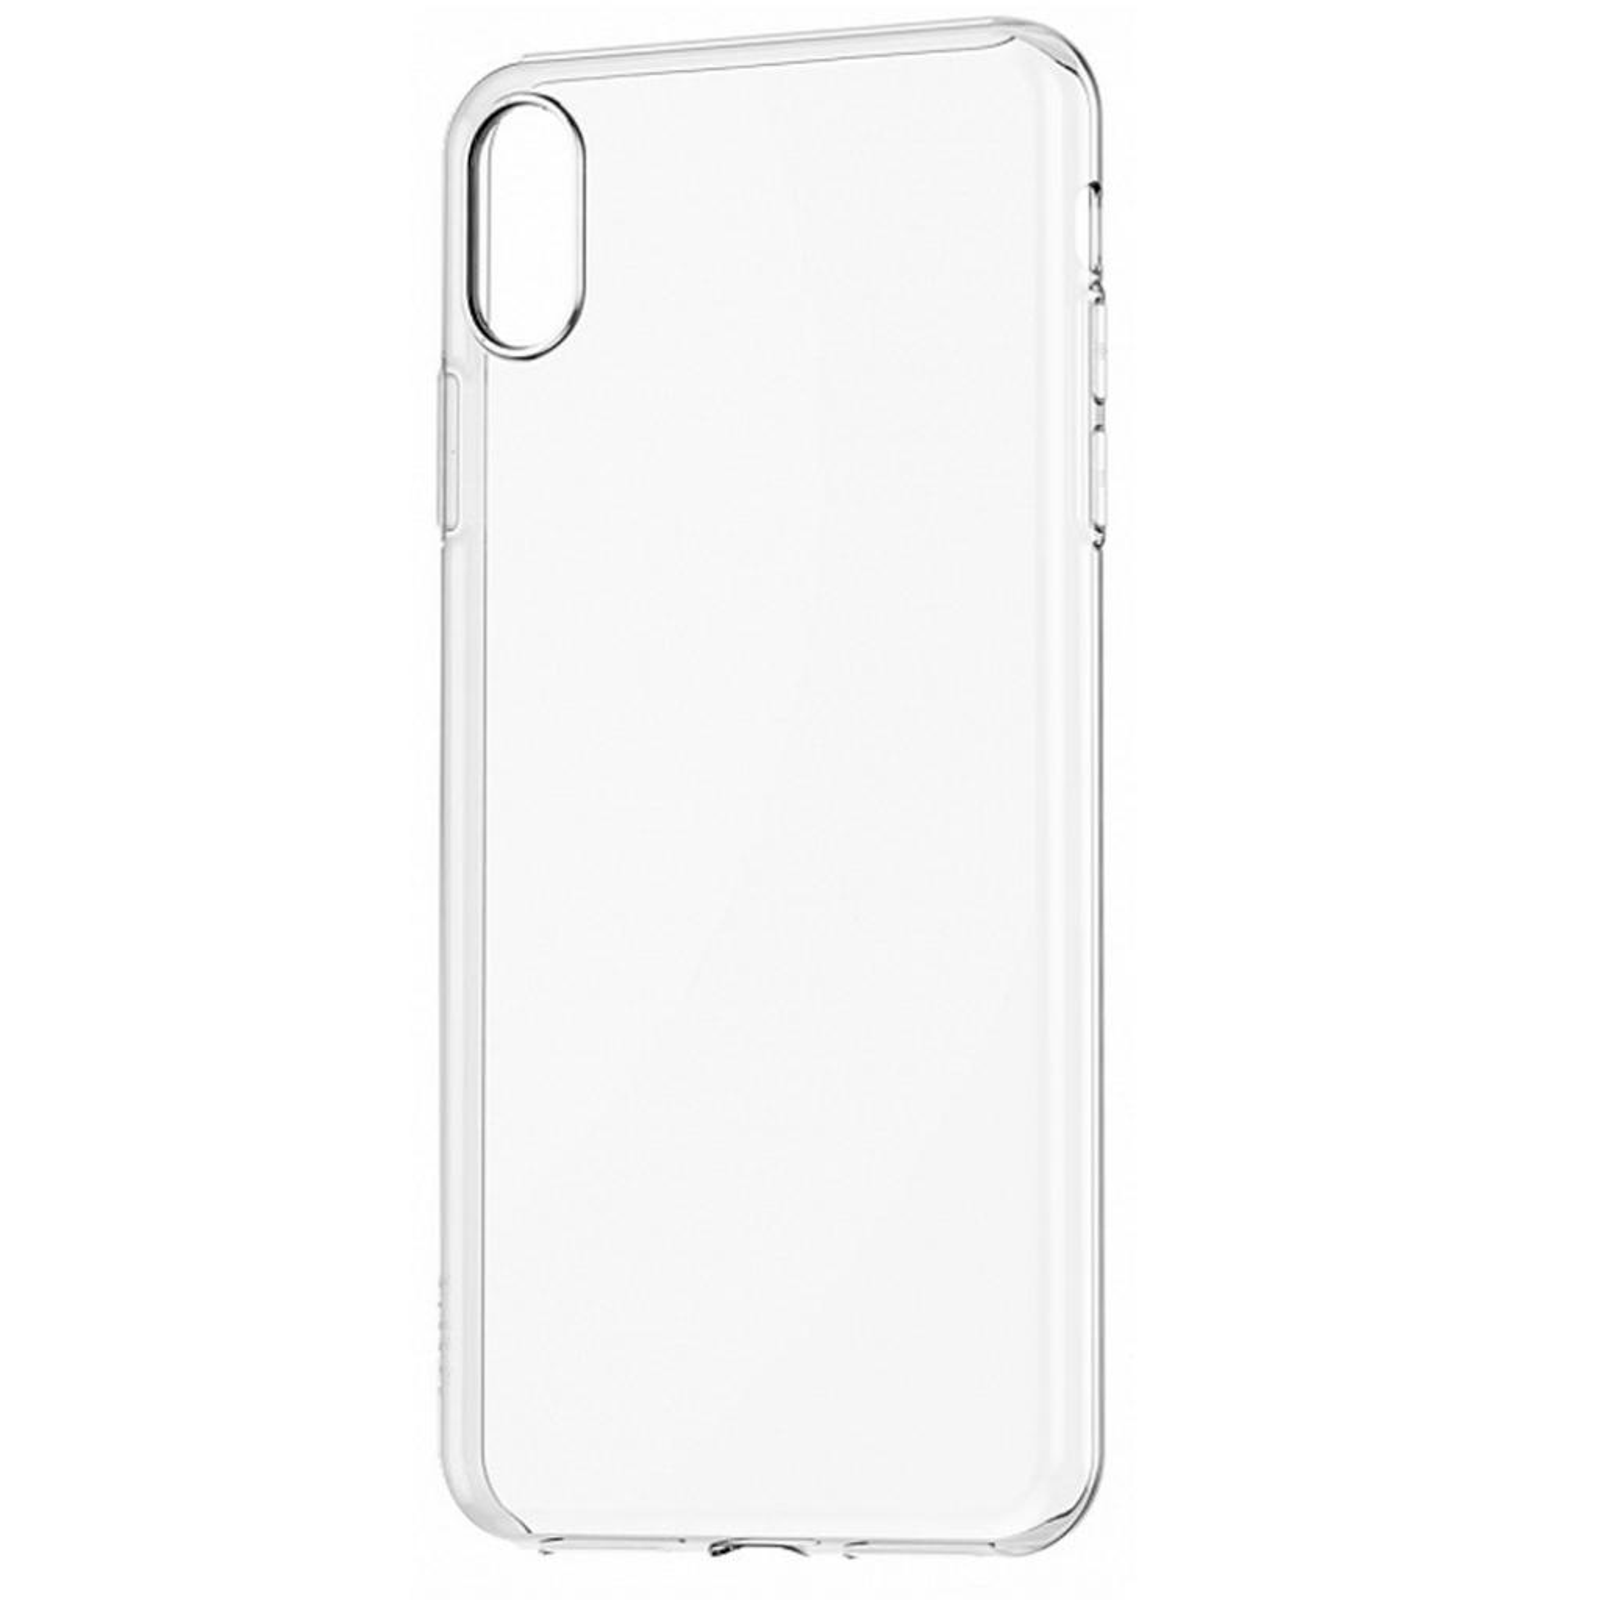 Чохол до моб. телефона Baseus iPhone XS Max Simplicity basic, TR (ARAPIPH65-B02) зображення 3